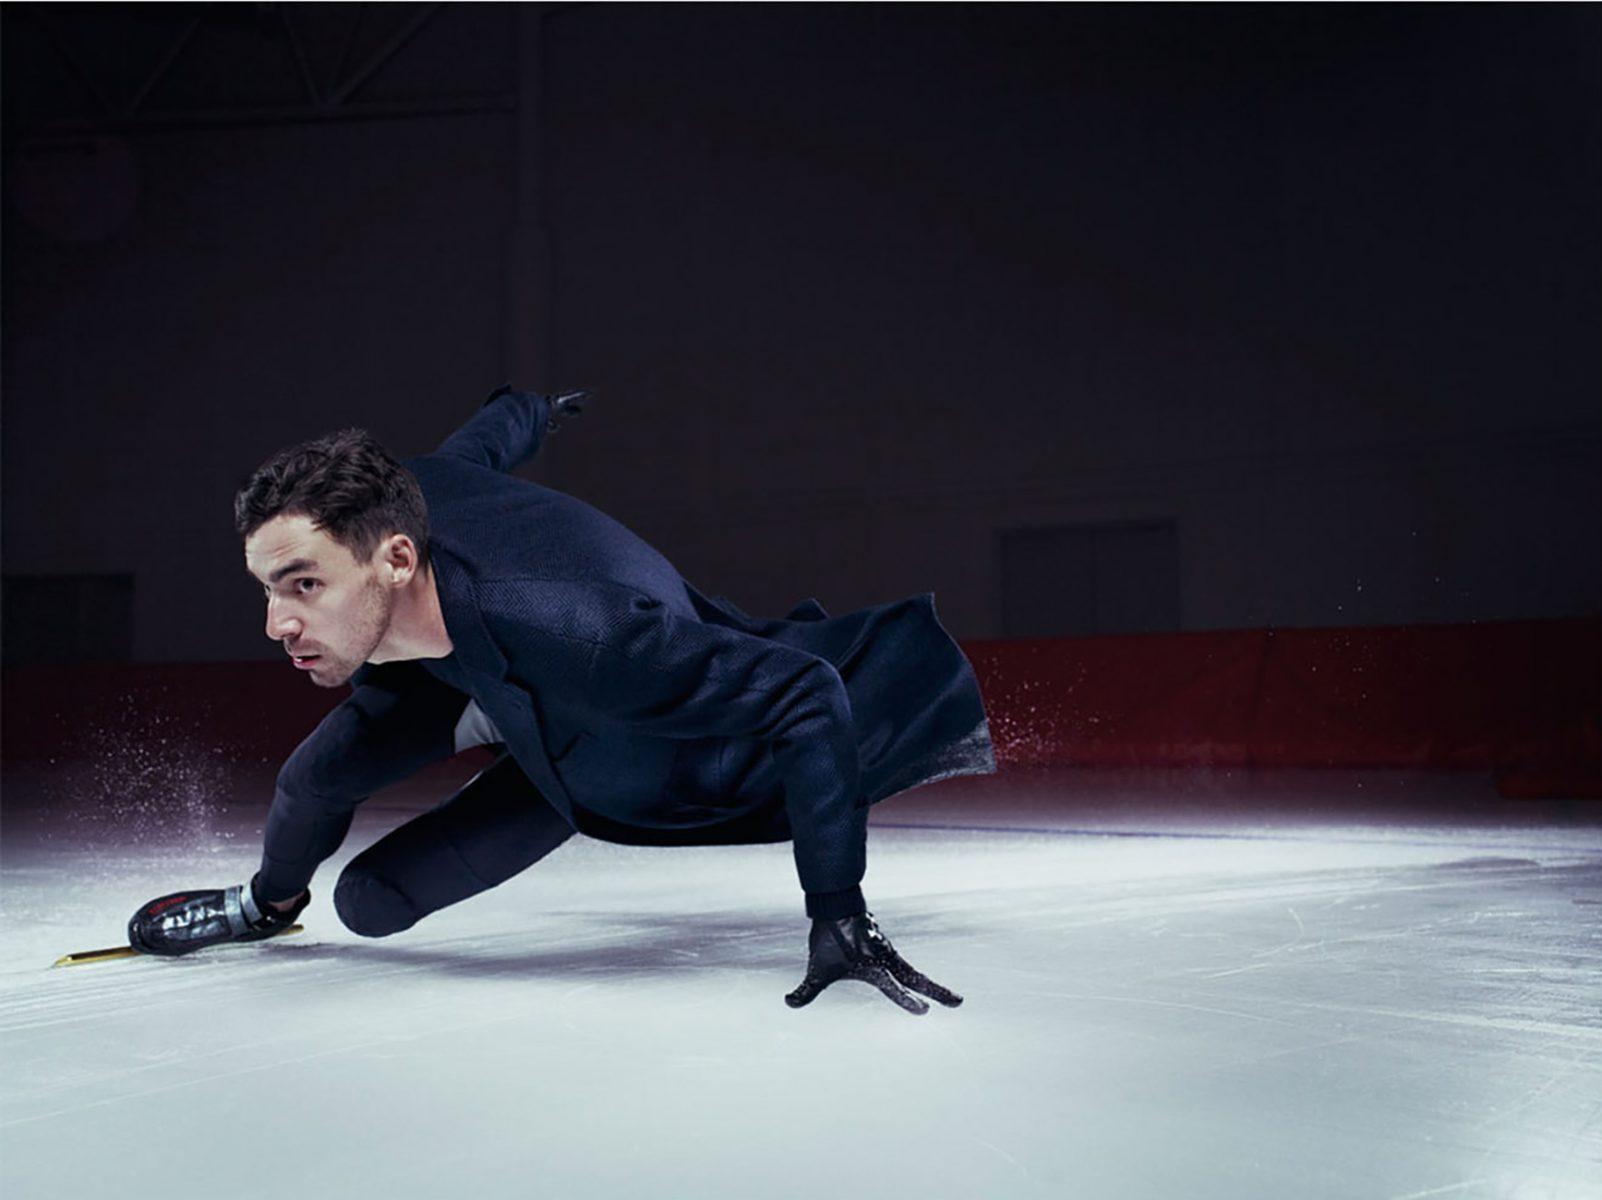 Mens Journal / US Speed Skaters